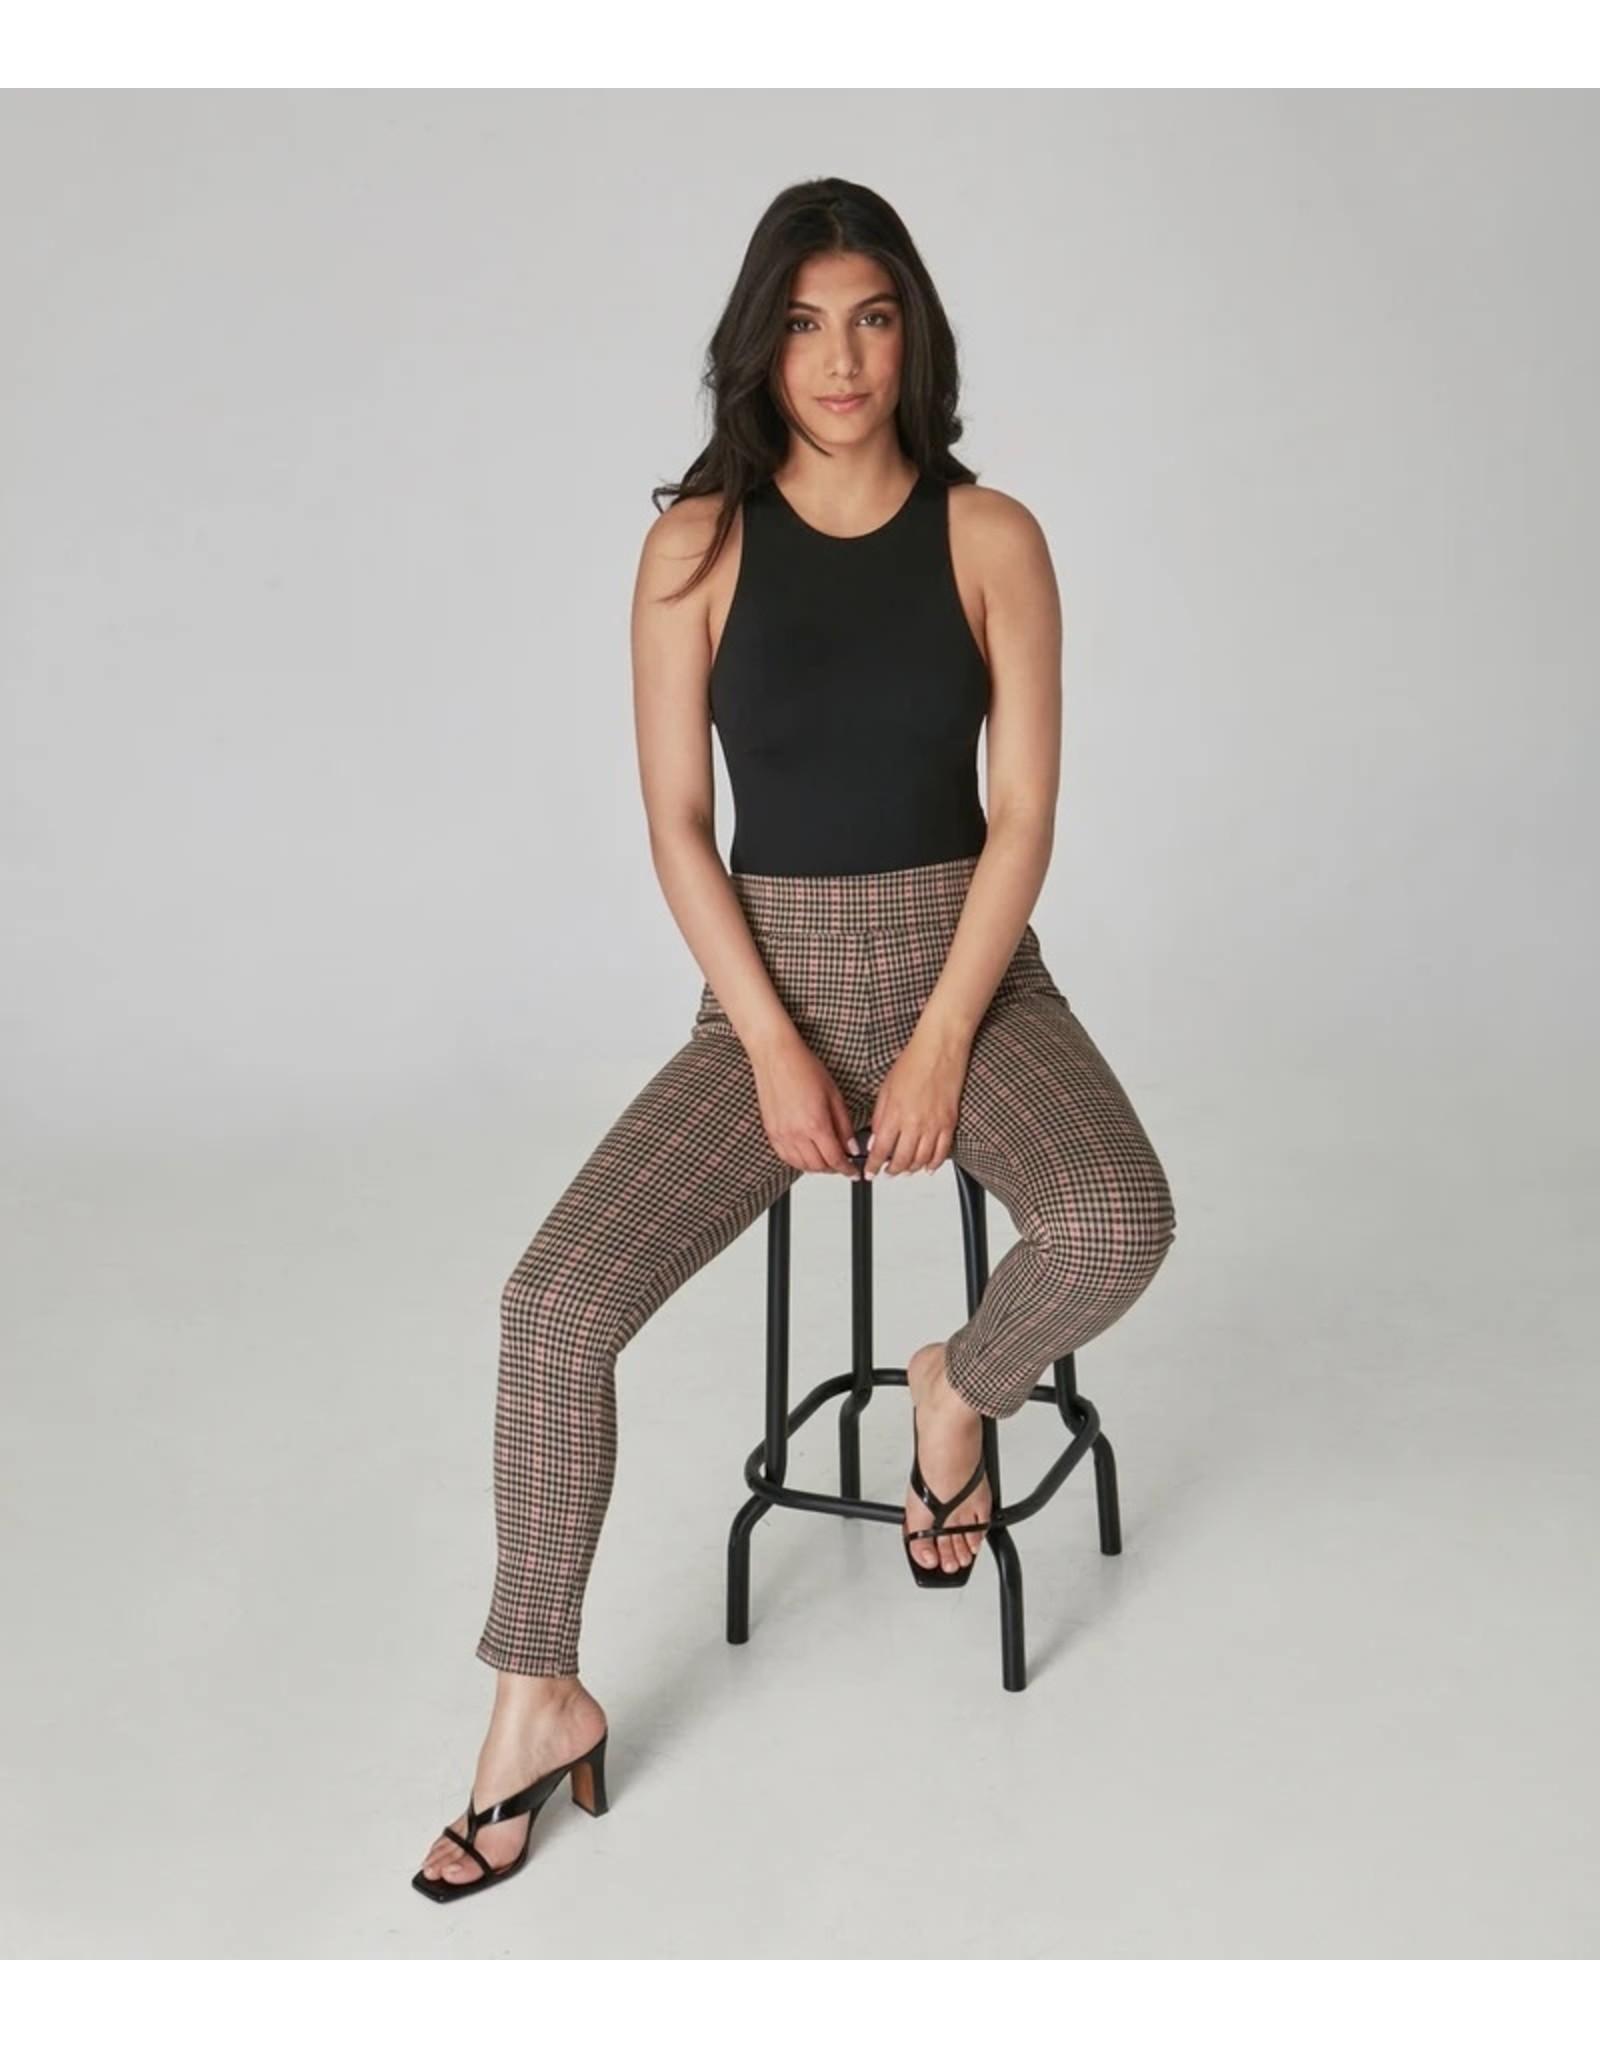 Lola Jeans Jacquard Leggings